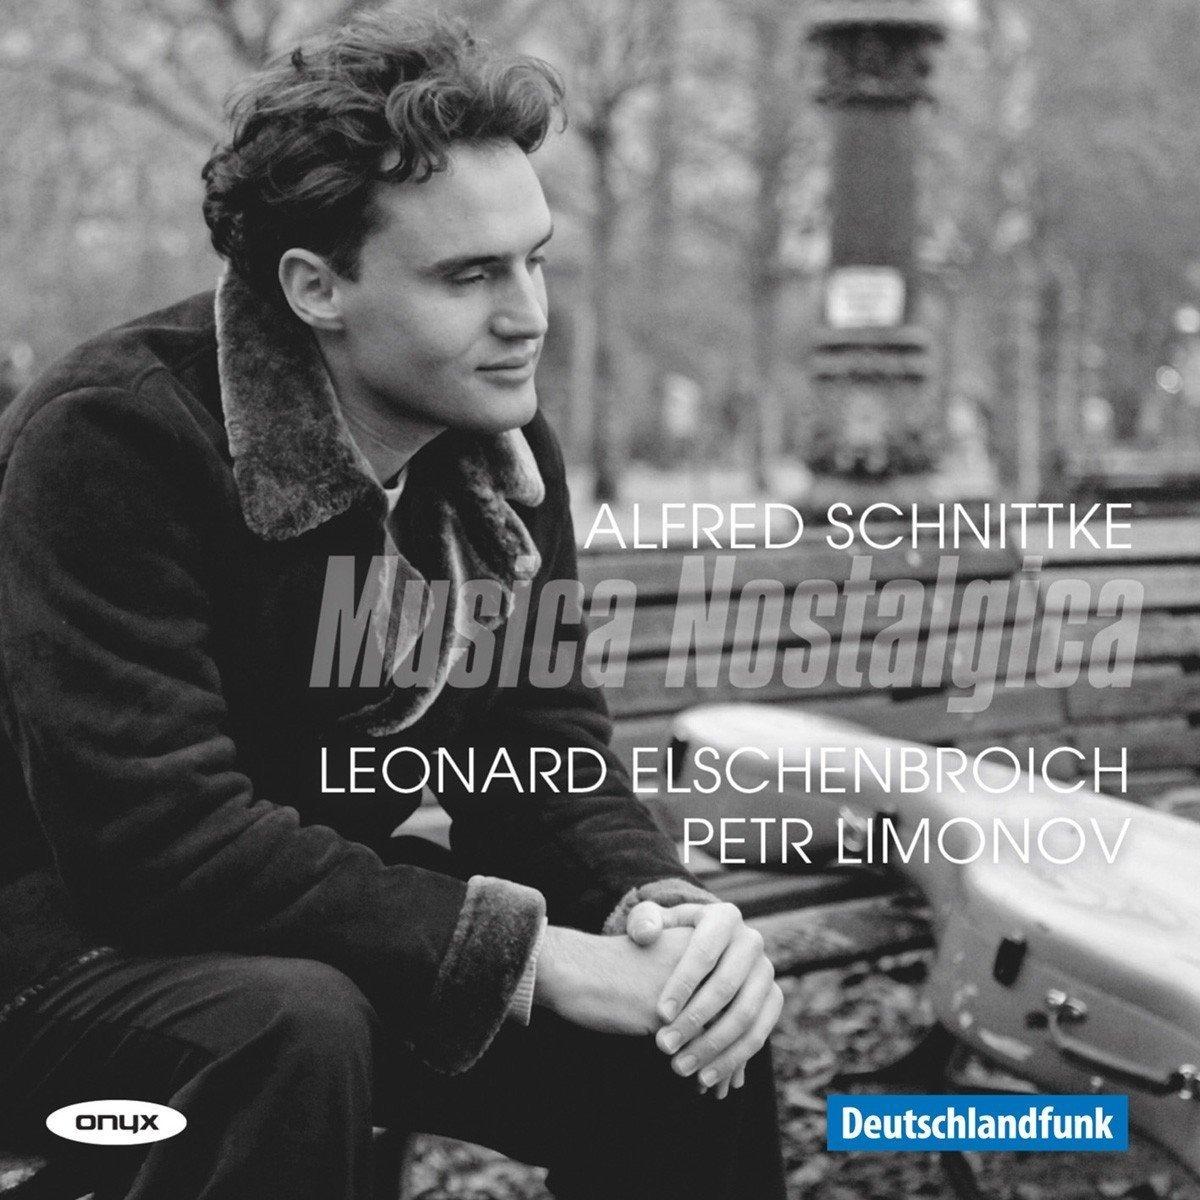 Leonard Elschenbroich, Petr Limonov, Alfred Schnittke, None  Schnittke:  Musica Nostalgica  Amazon Music